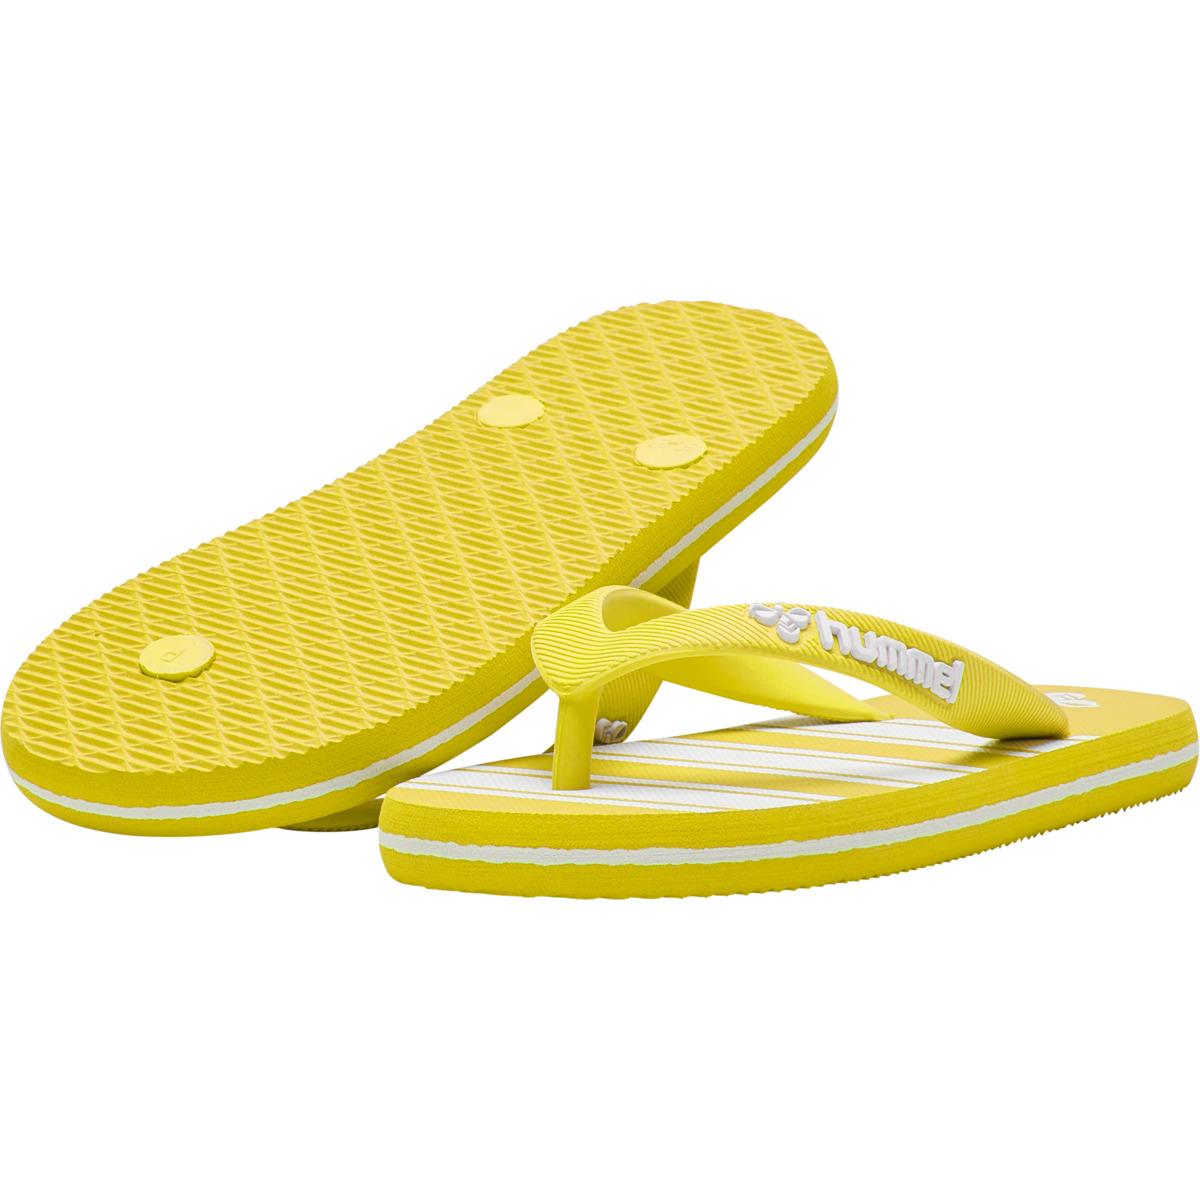 Hummel Flip Flop JR maize